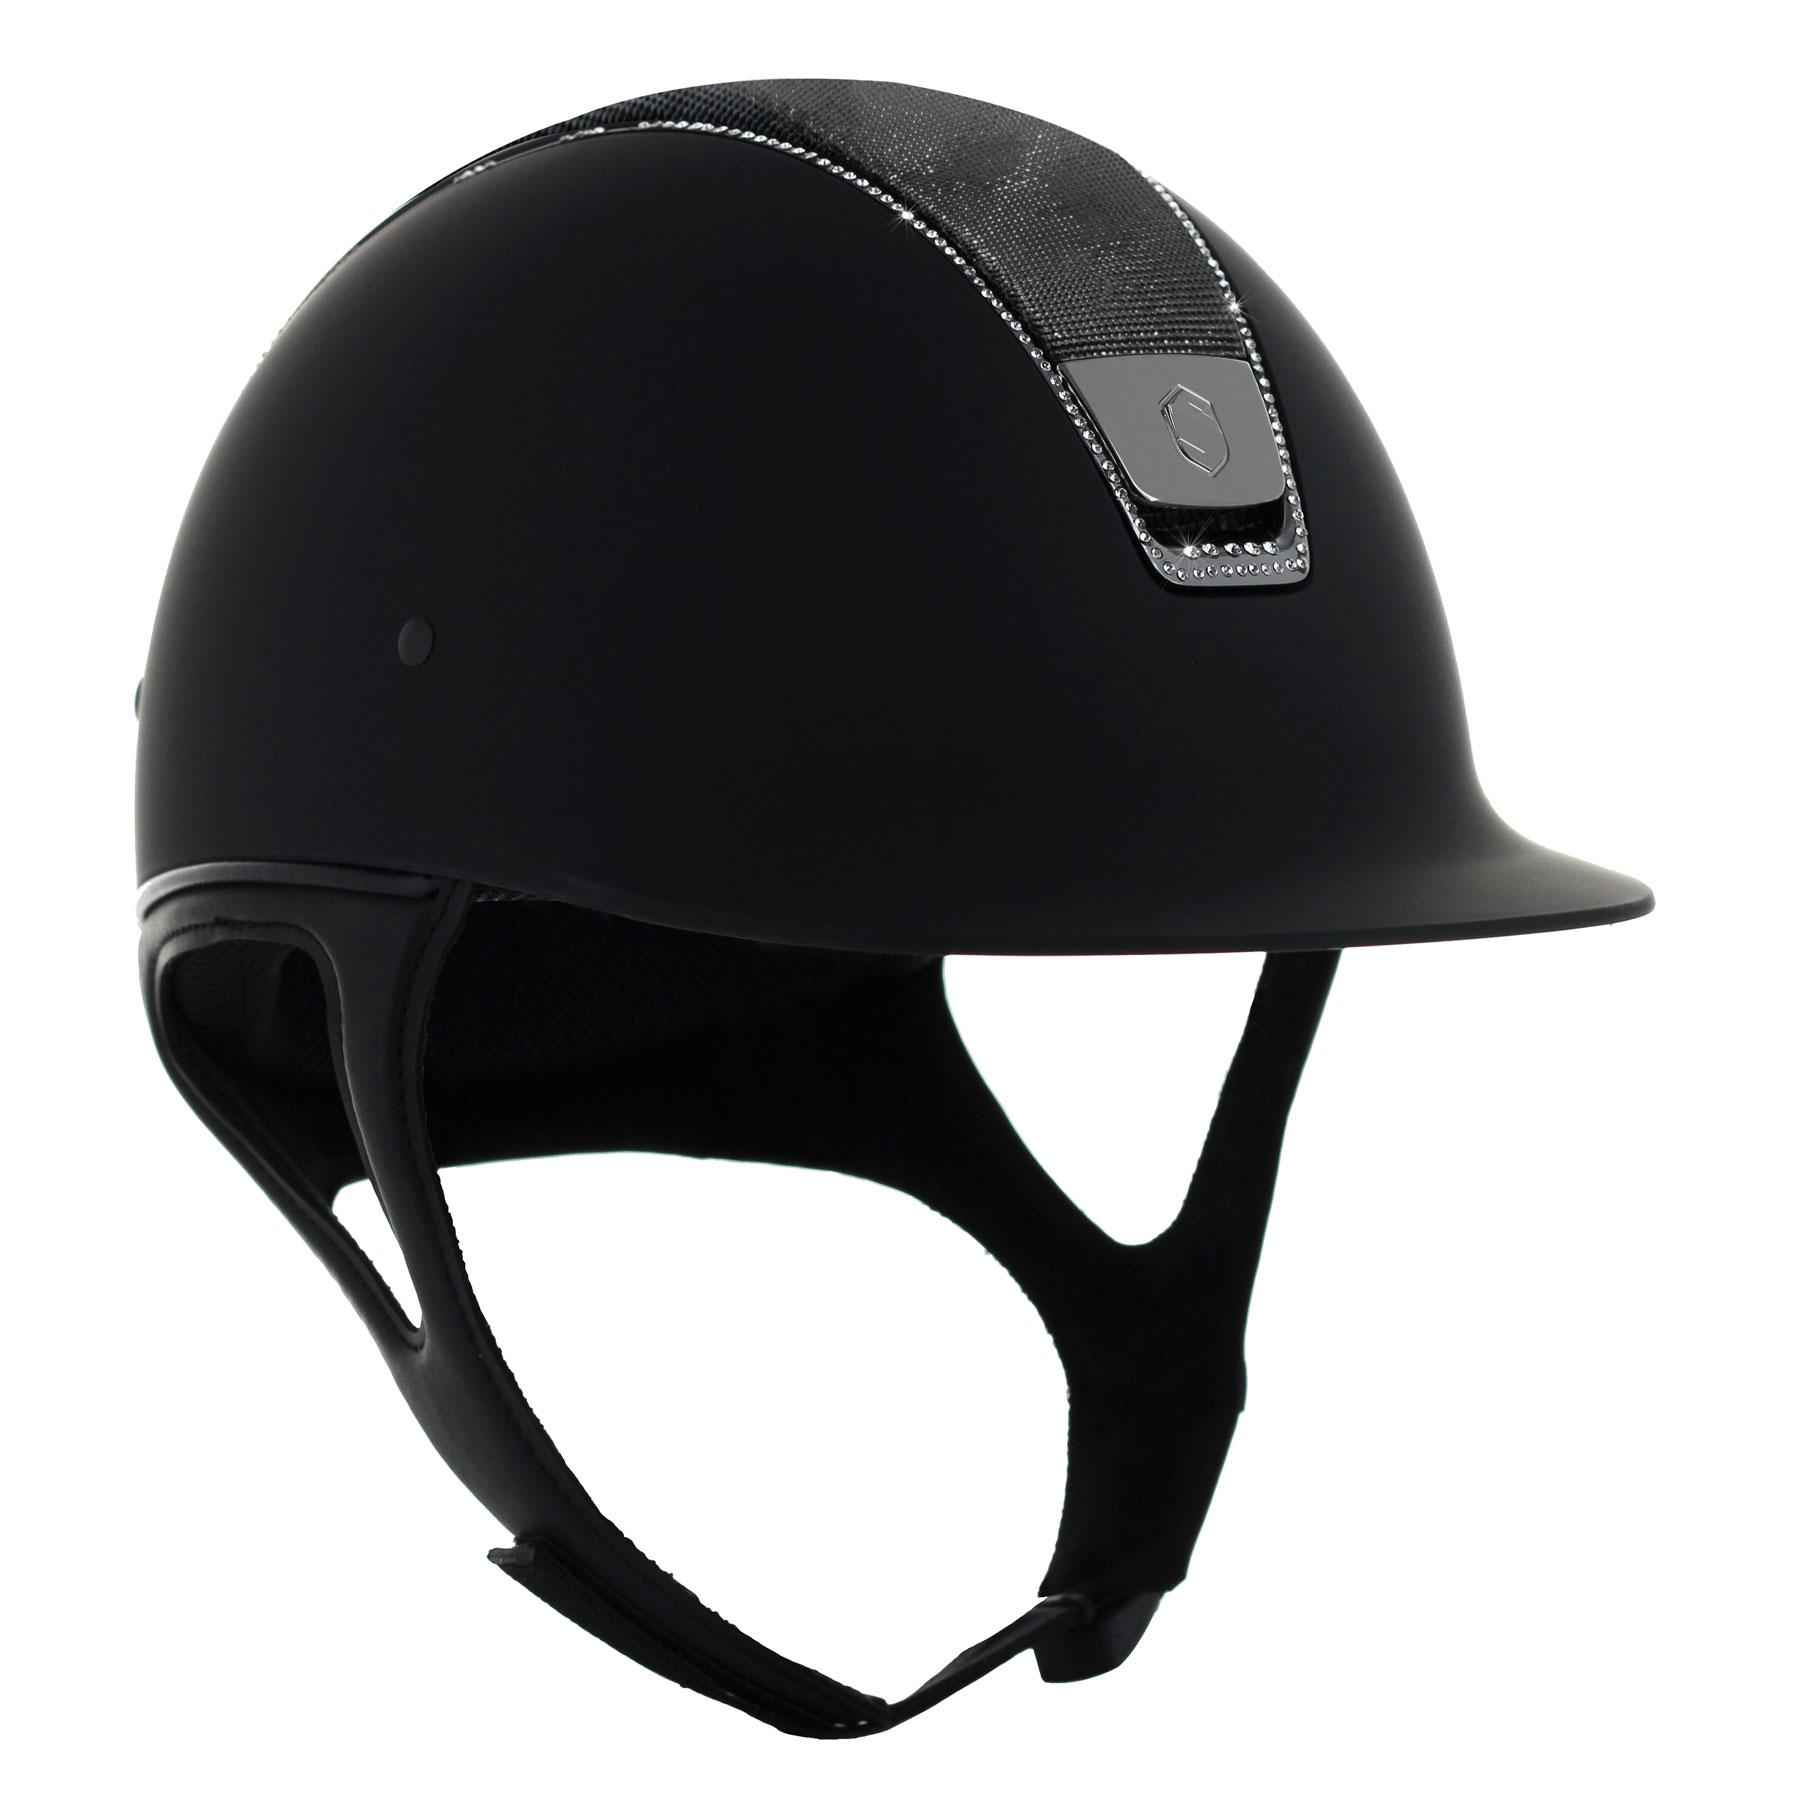 73b55c34c4011 Samshield Shadowmatt Helmet - Shimmer Top - 255 Swarovski - Royal ...